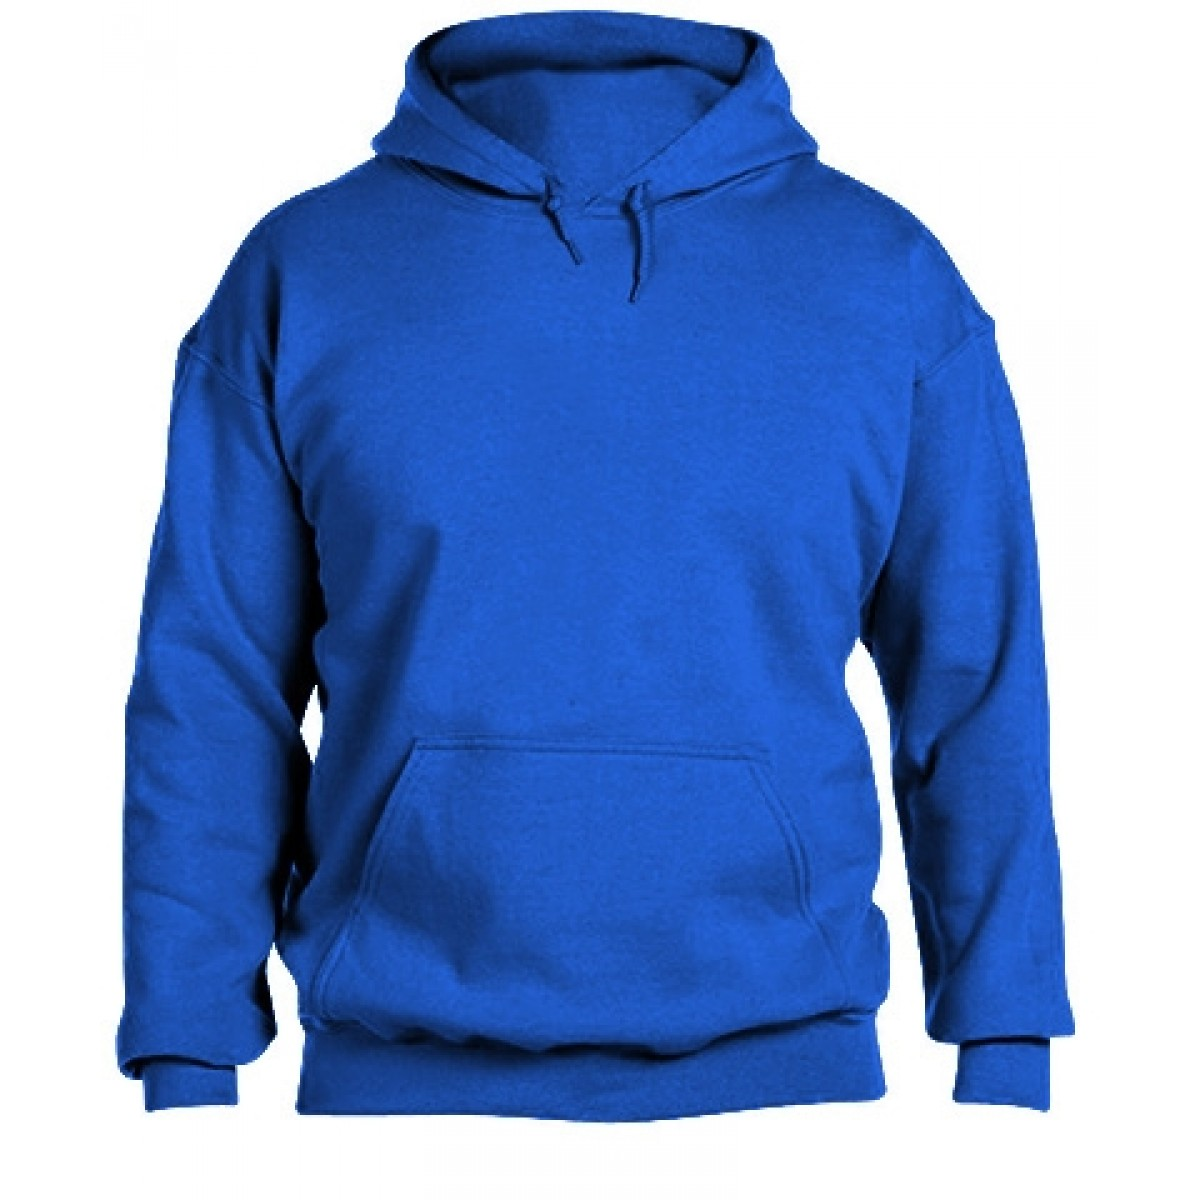 Solid Hooded Sweatshirt  50/50 Heavy Blend-Royal Blue-2XL